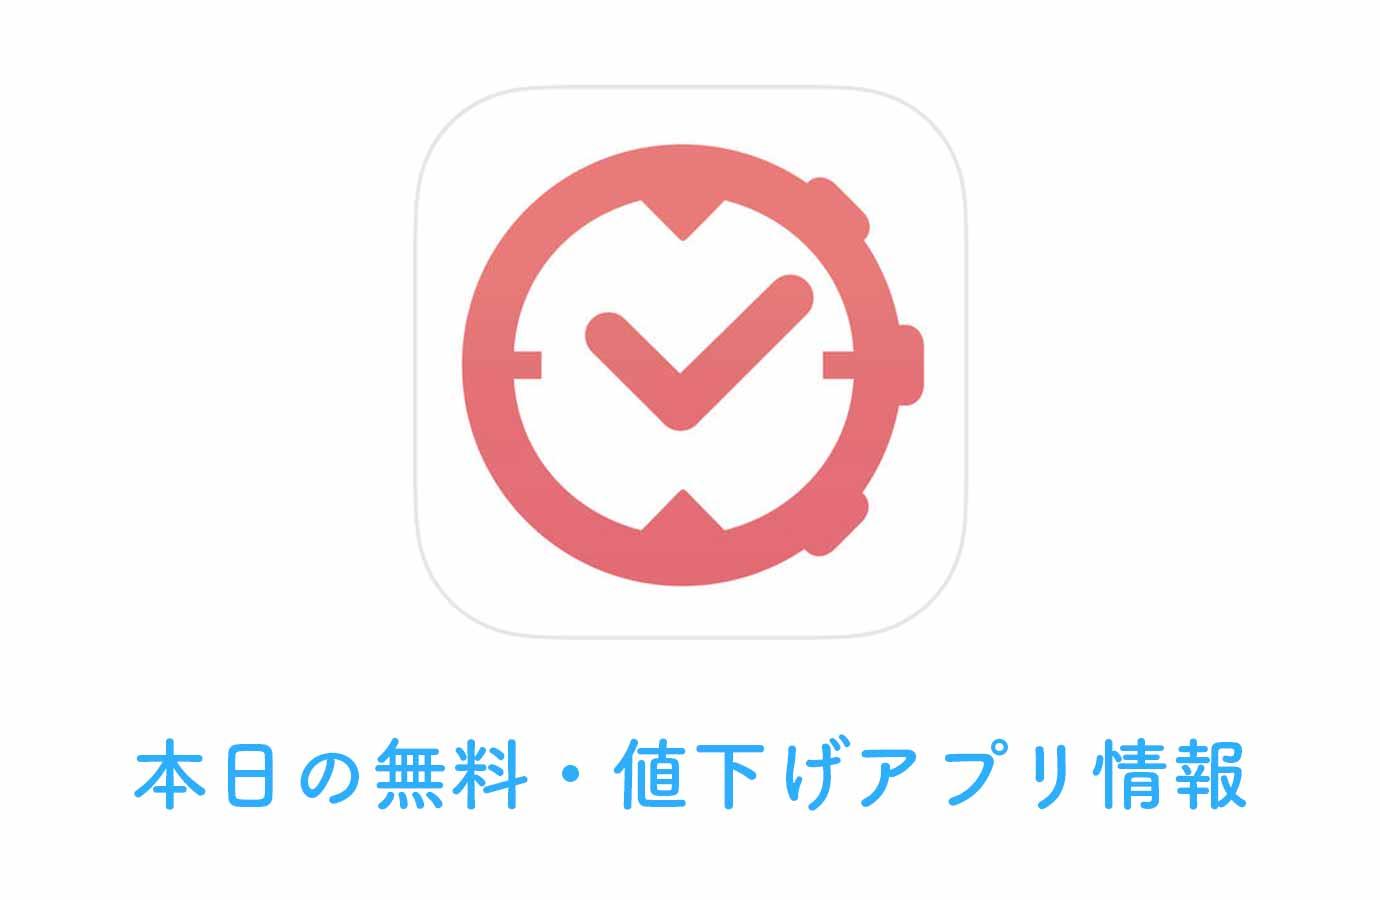 Appsale0401